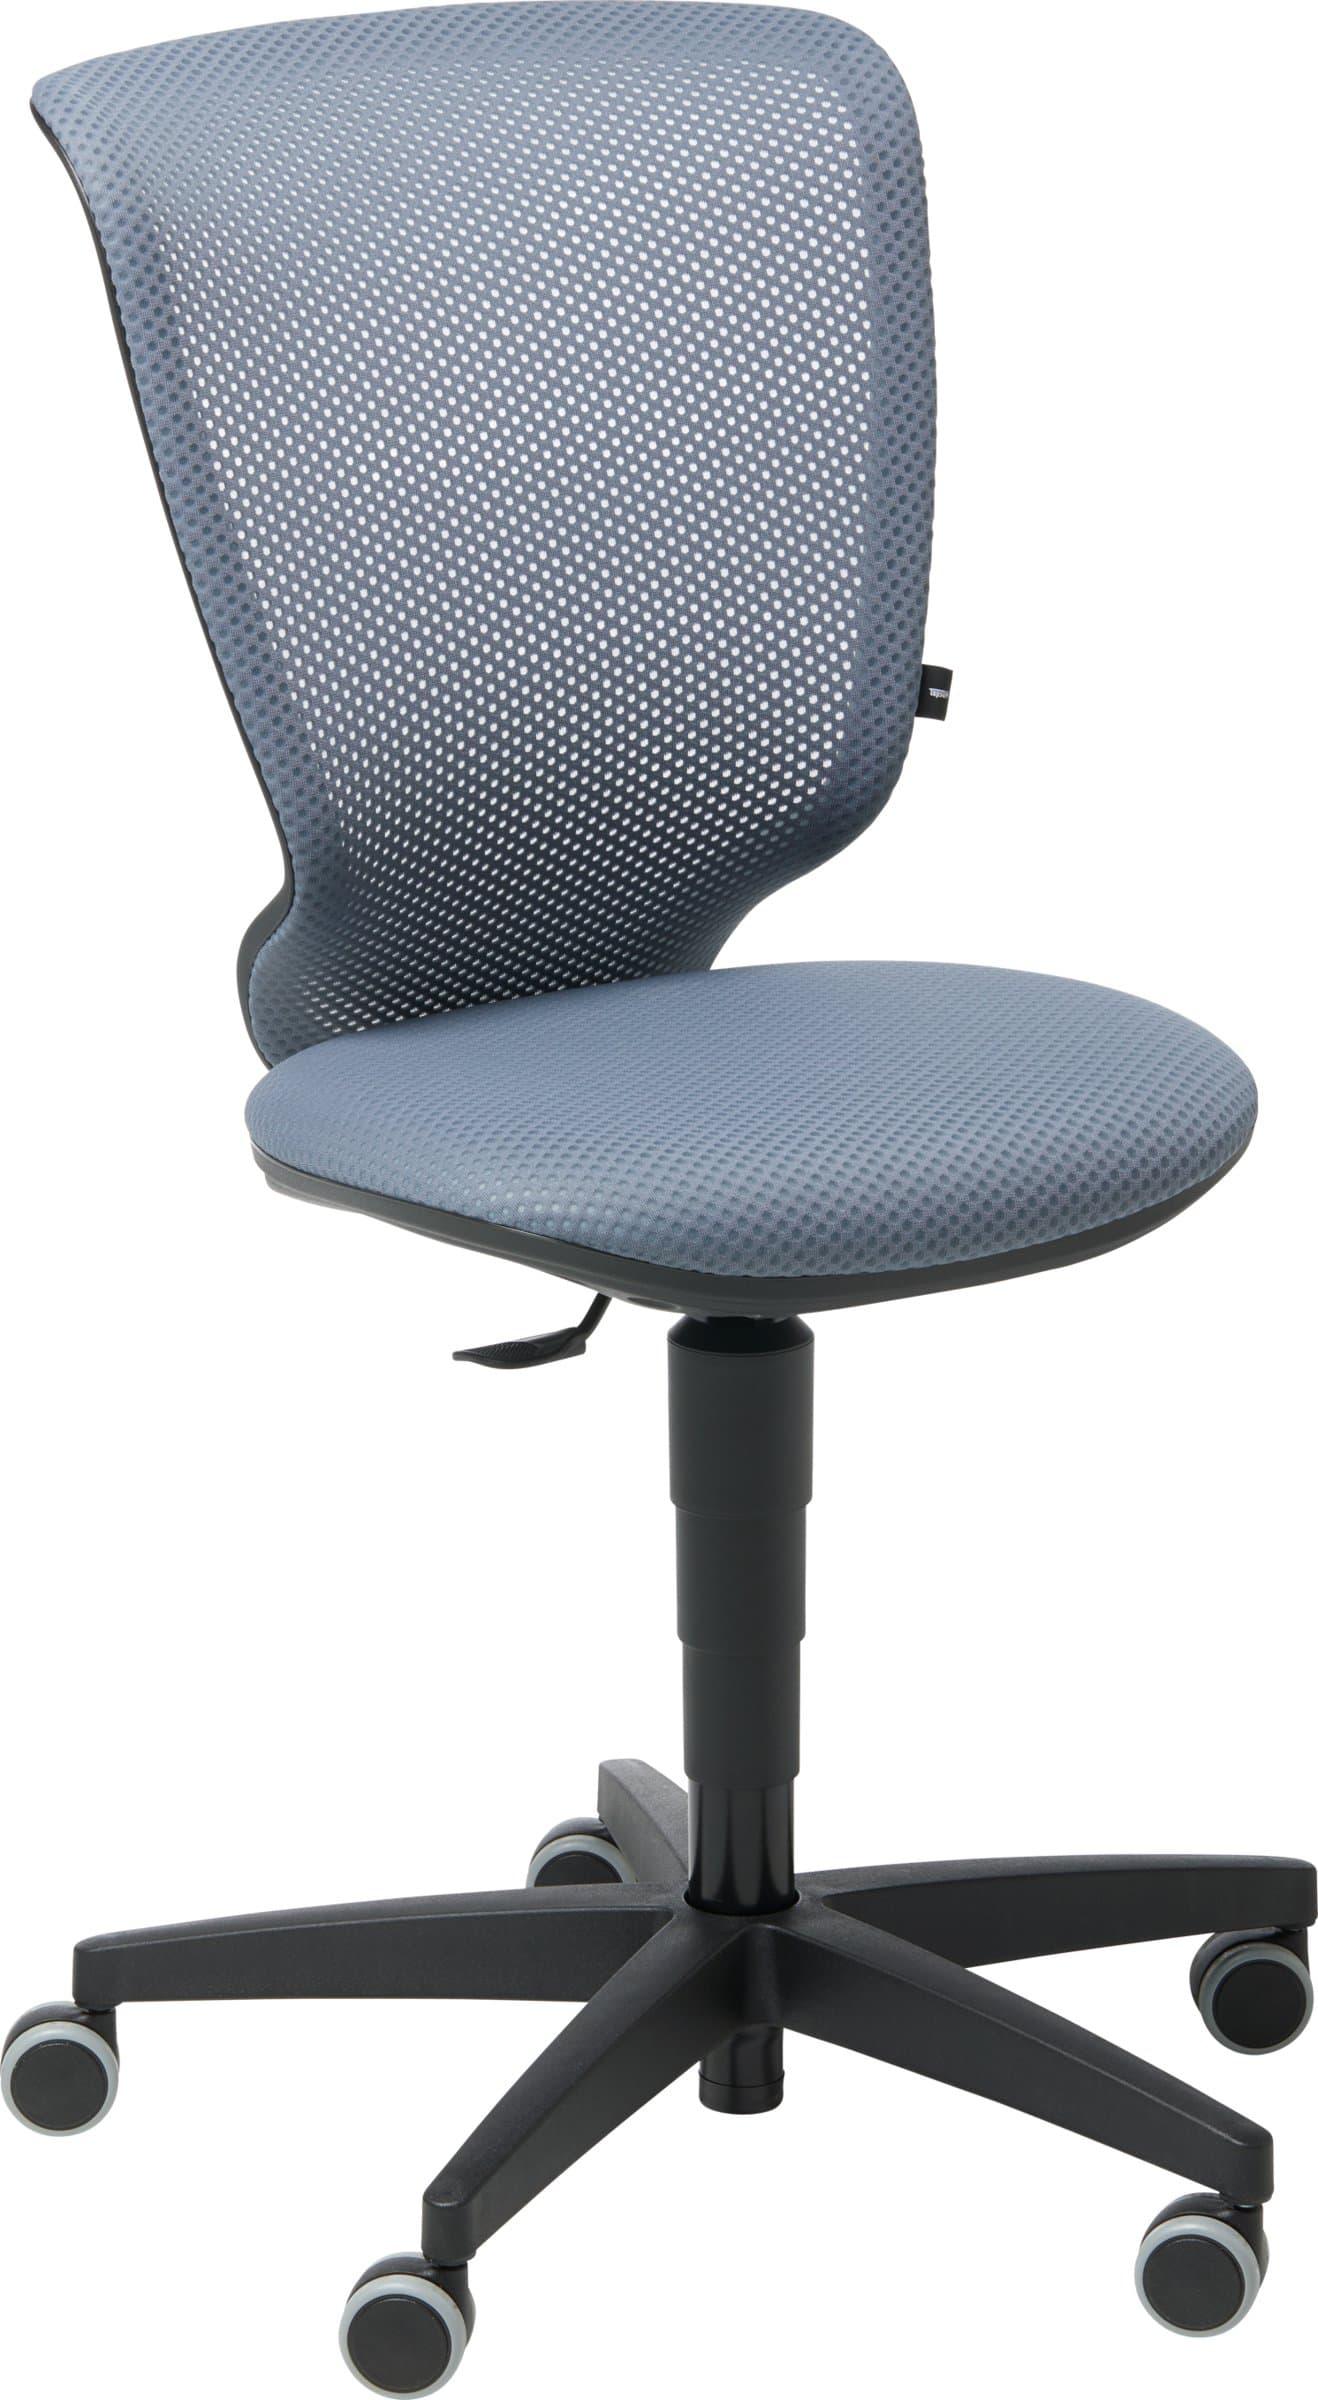 Adolescent MigrosRobinson De Chaise Chaise Bureau MigrosRobinson X80PNwknO